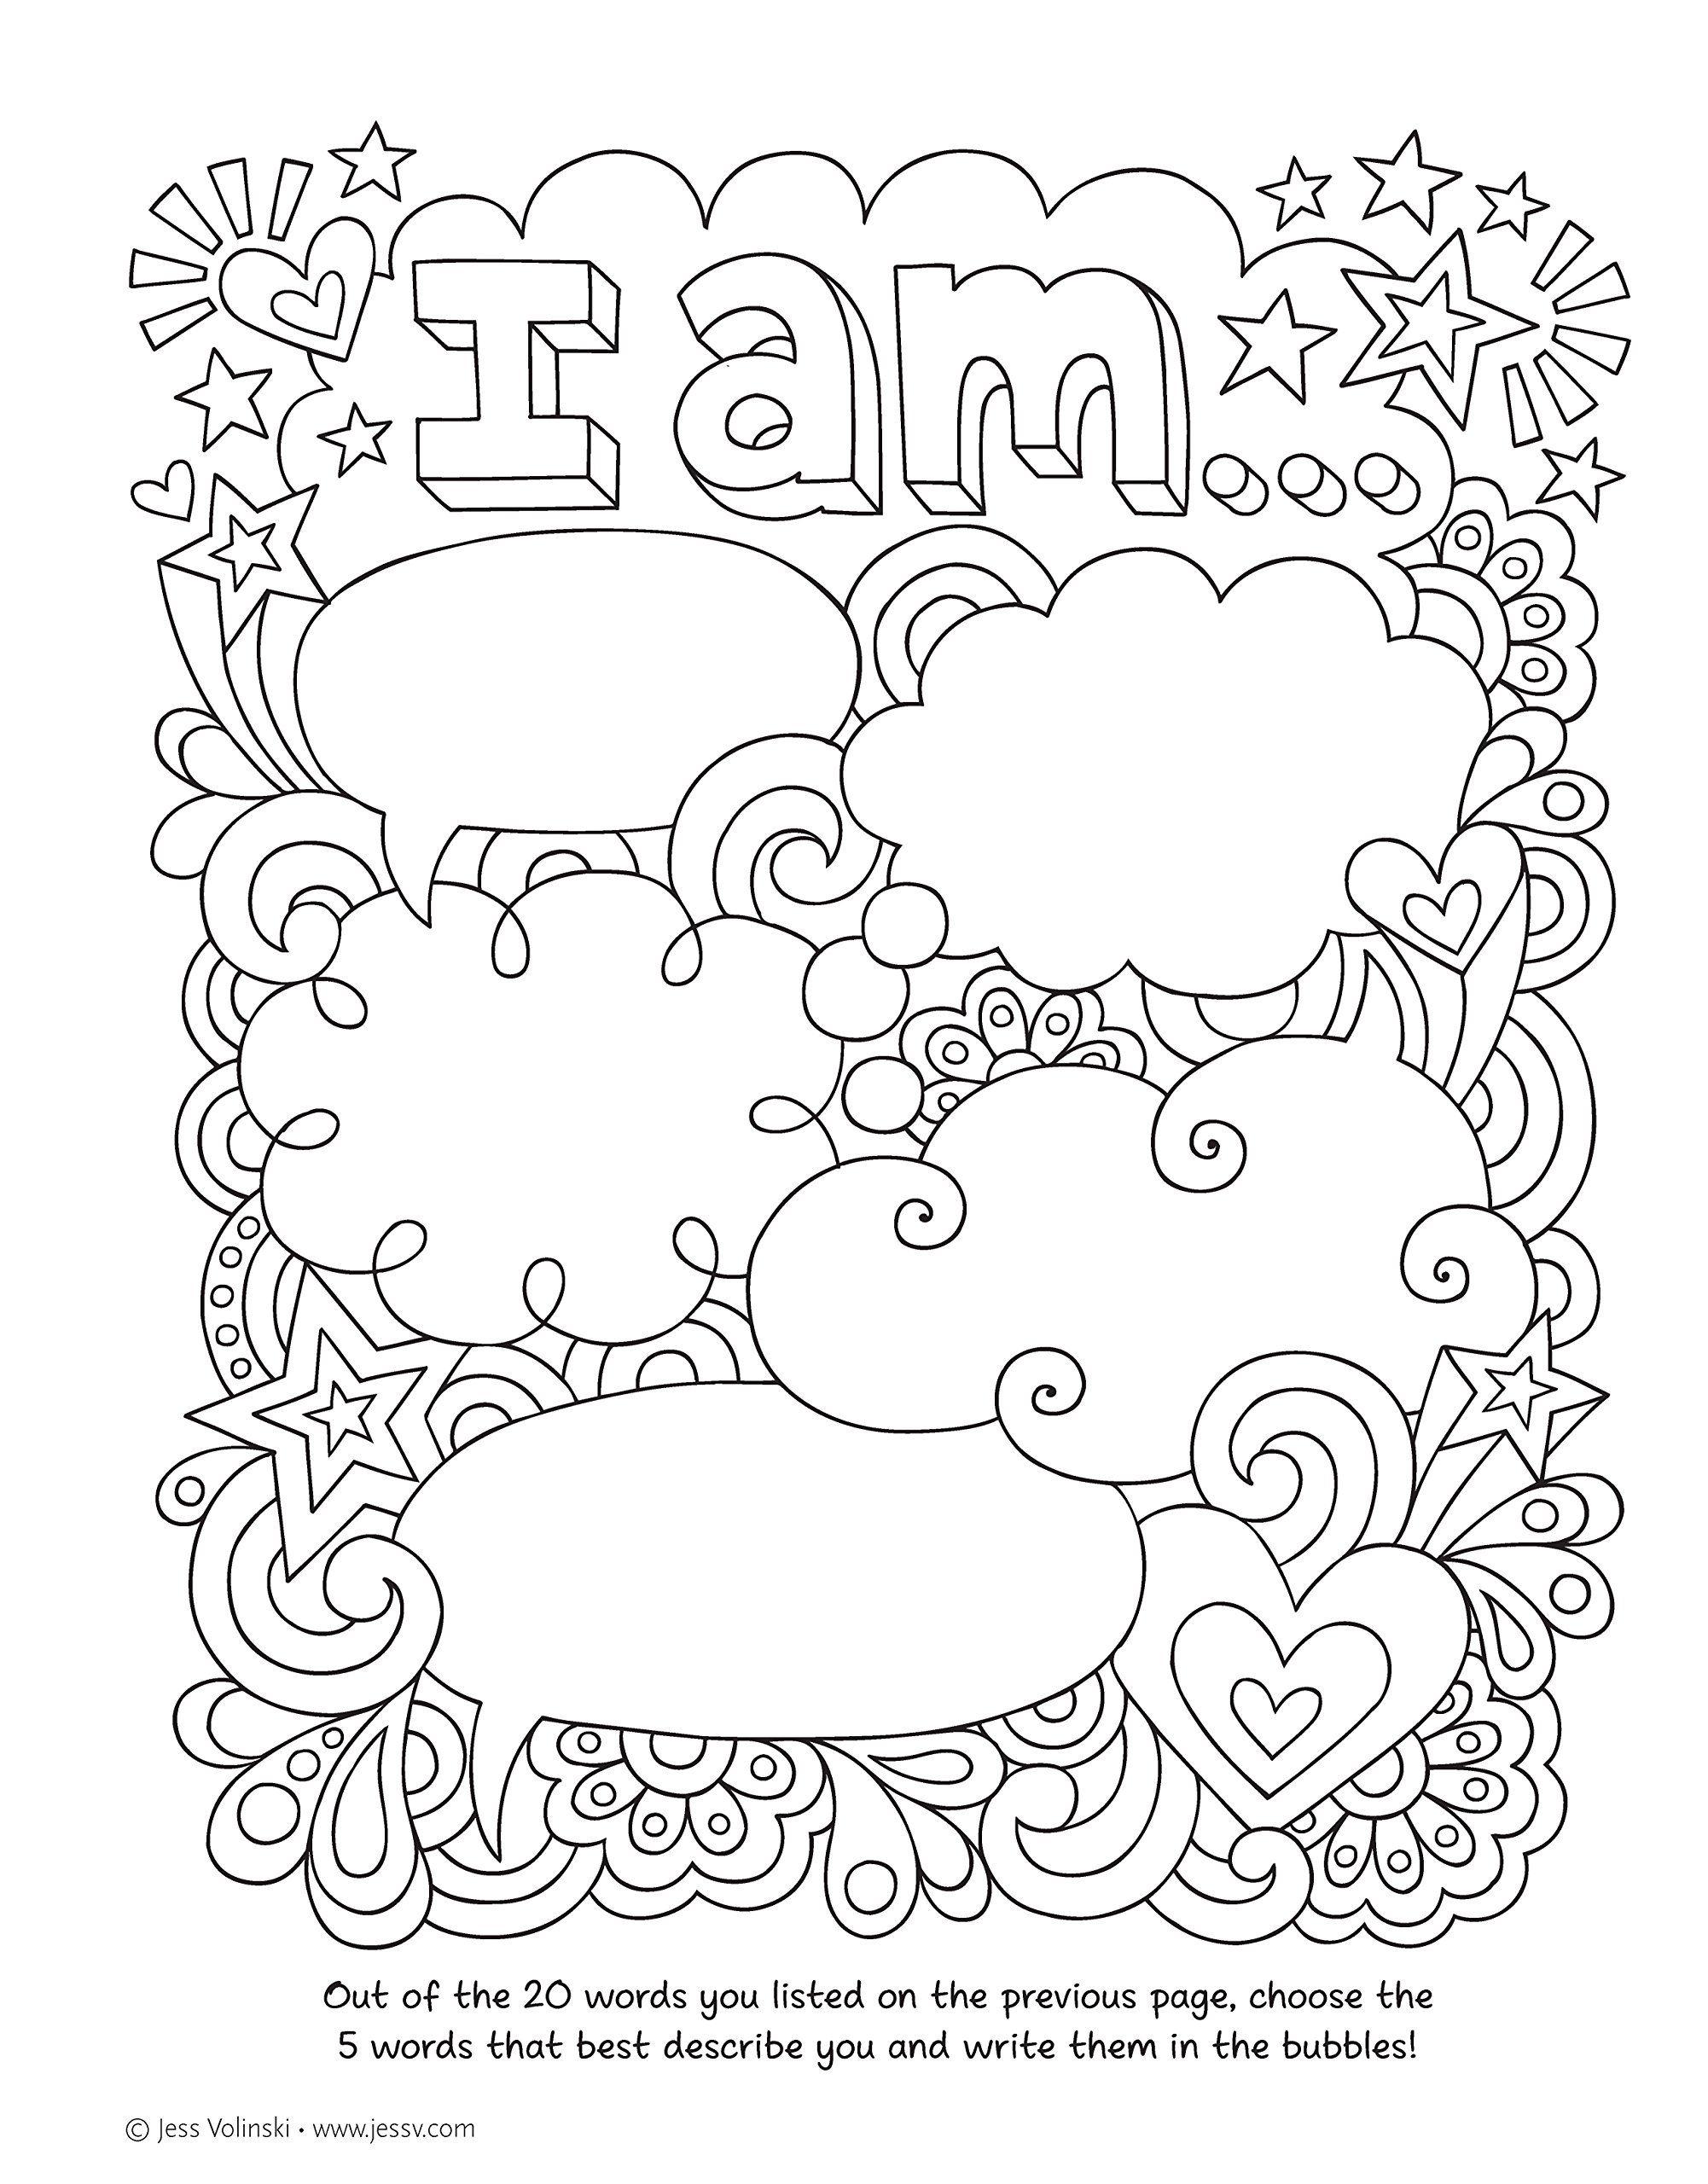 Notebook Doodles Go Girl Coloring